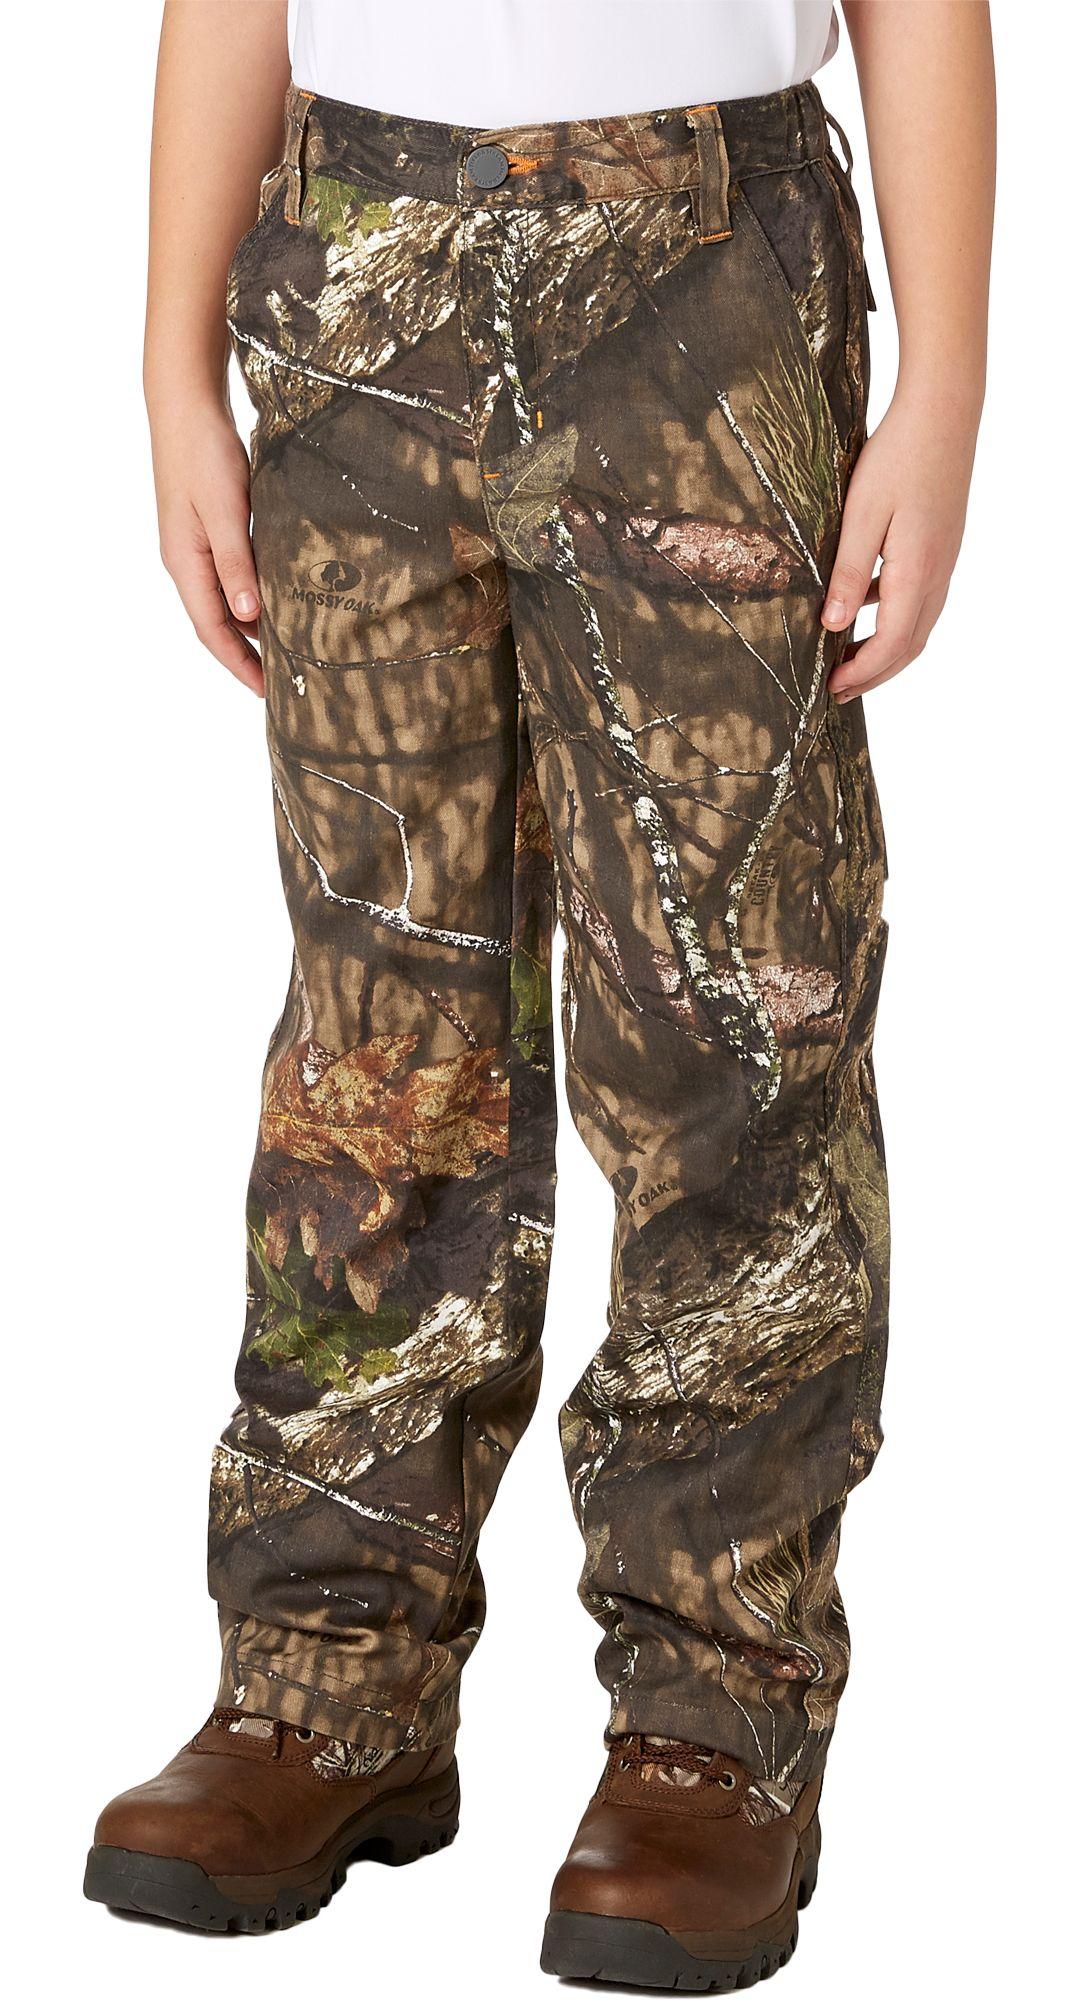 663b854413605 Field & Stream Youth Cotton Twill Pants | Field & Stream